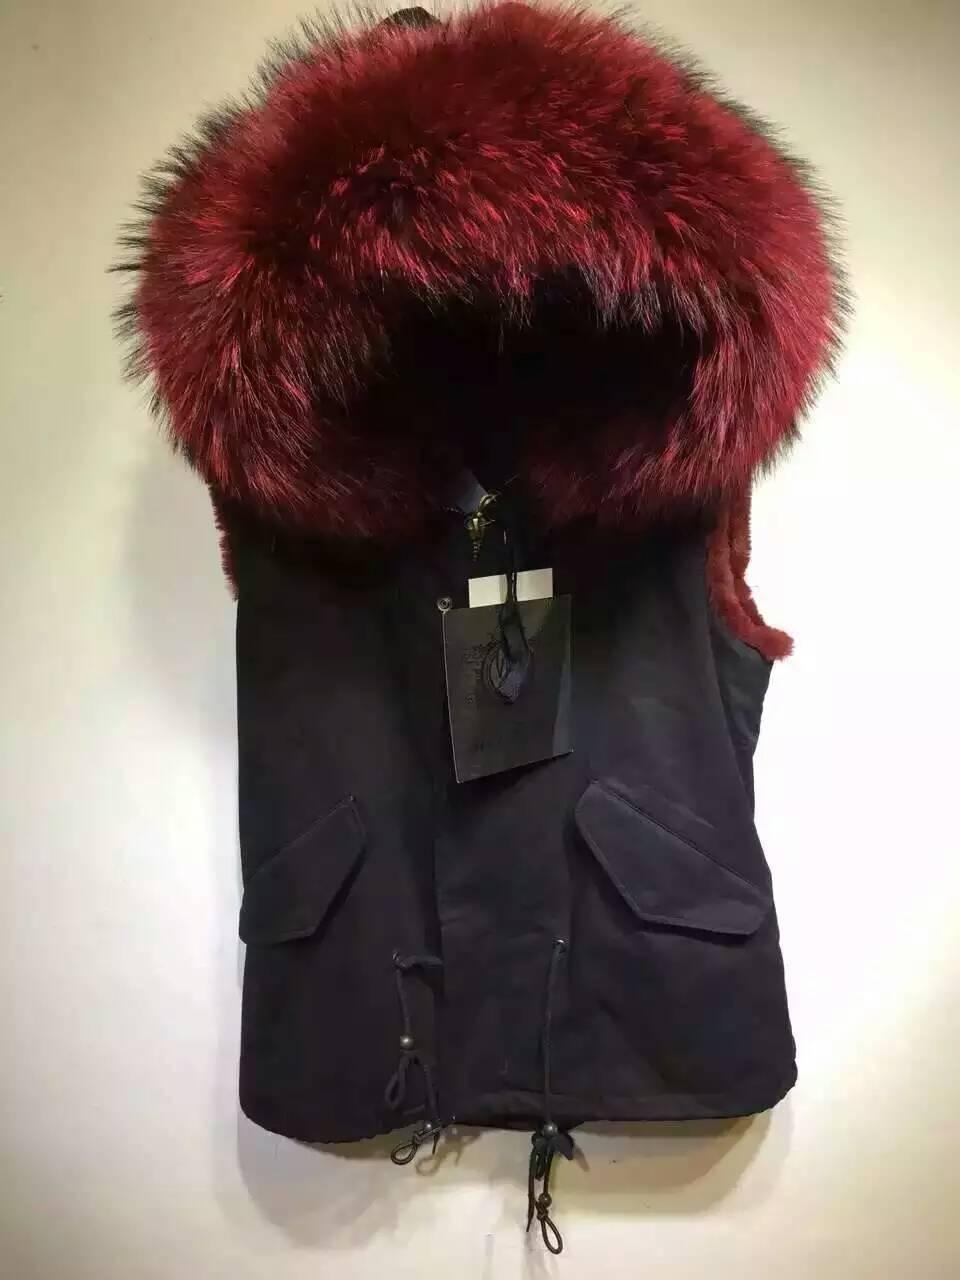 2016 New Plus Size Winter Coat Women Slim Waist Long Jacket Coat Real Raccoon Fur Collar Parka Fashion White Fake fur Coat